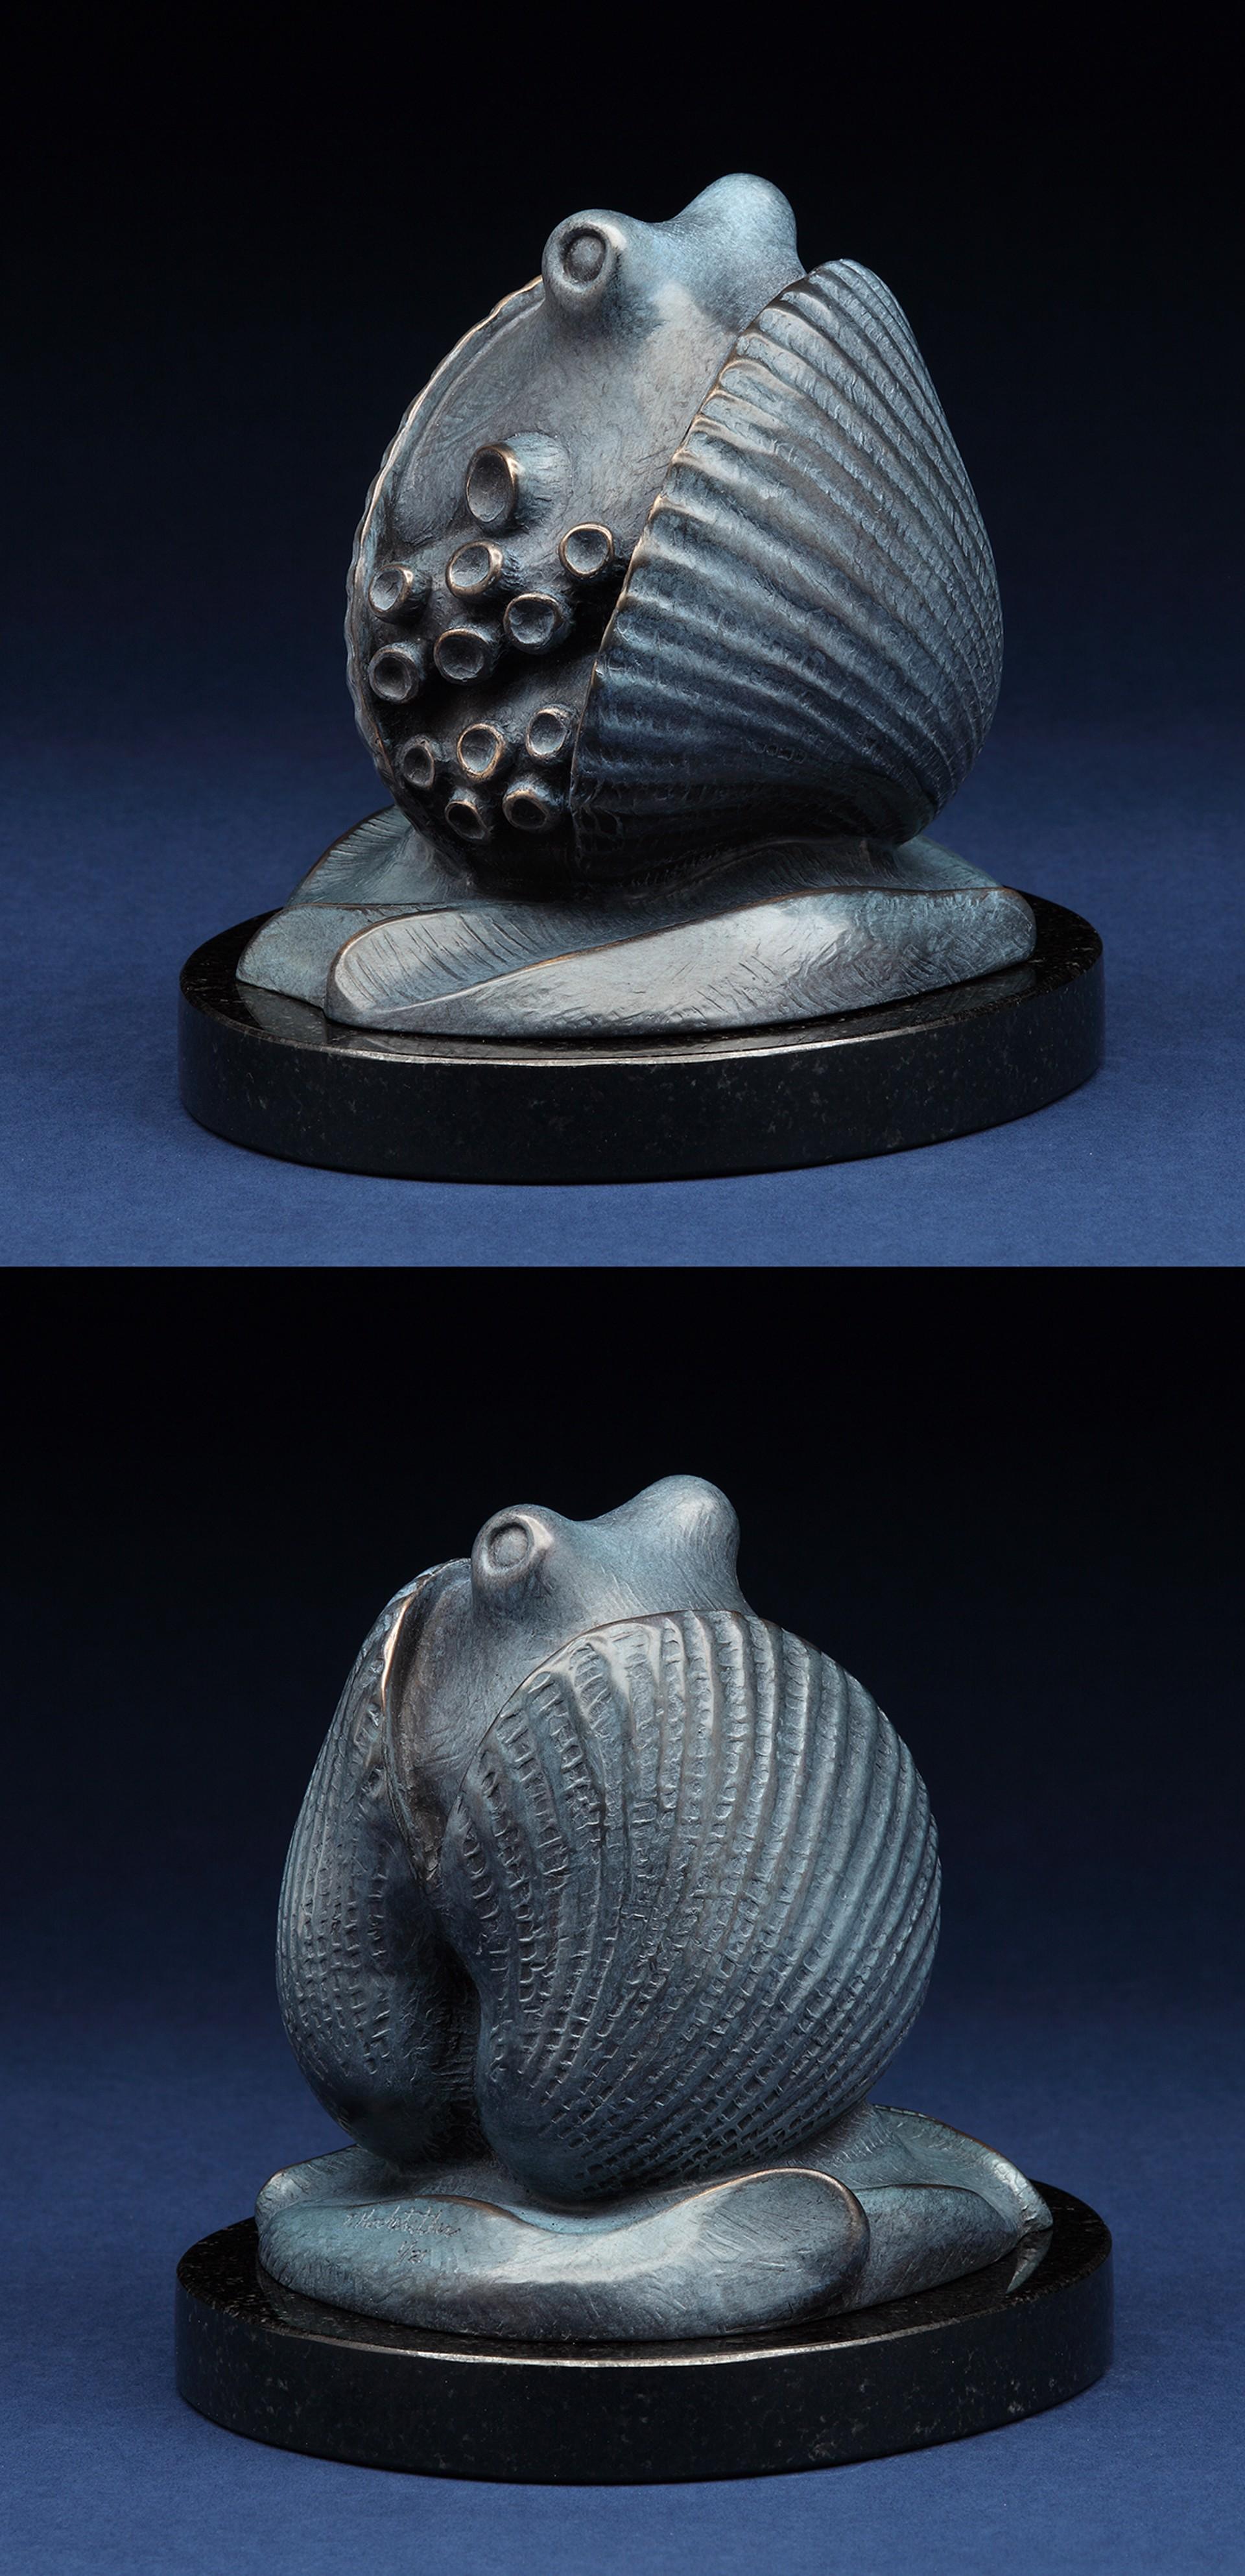 Octopus and Shell by Tony Hochstetler